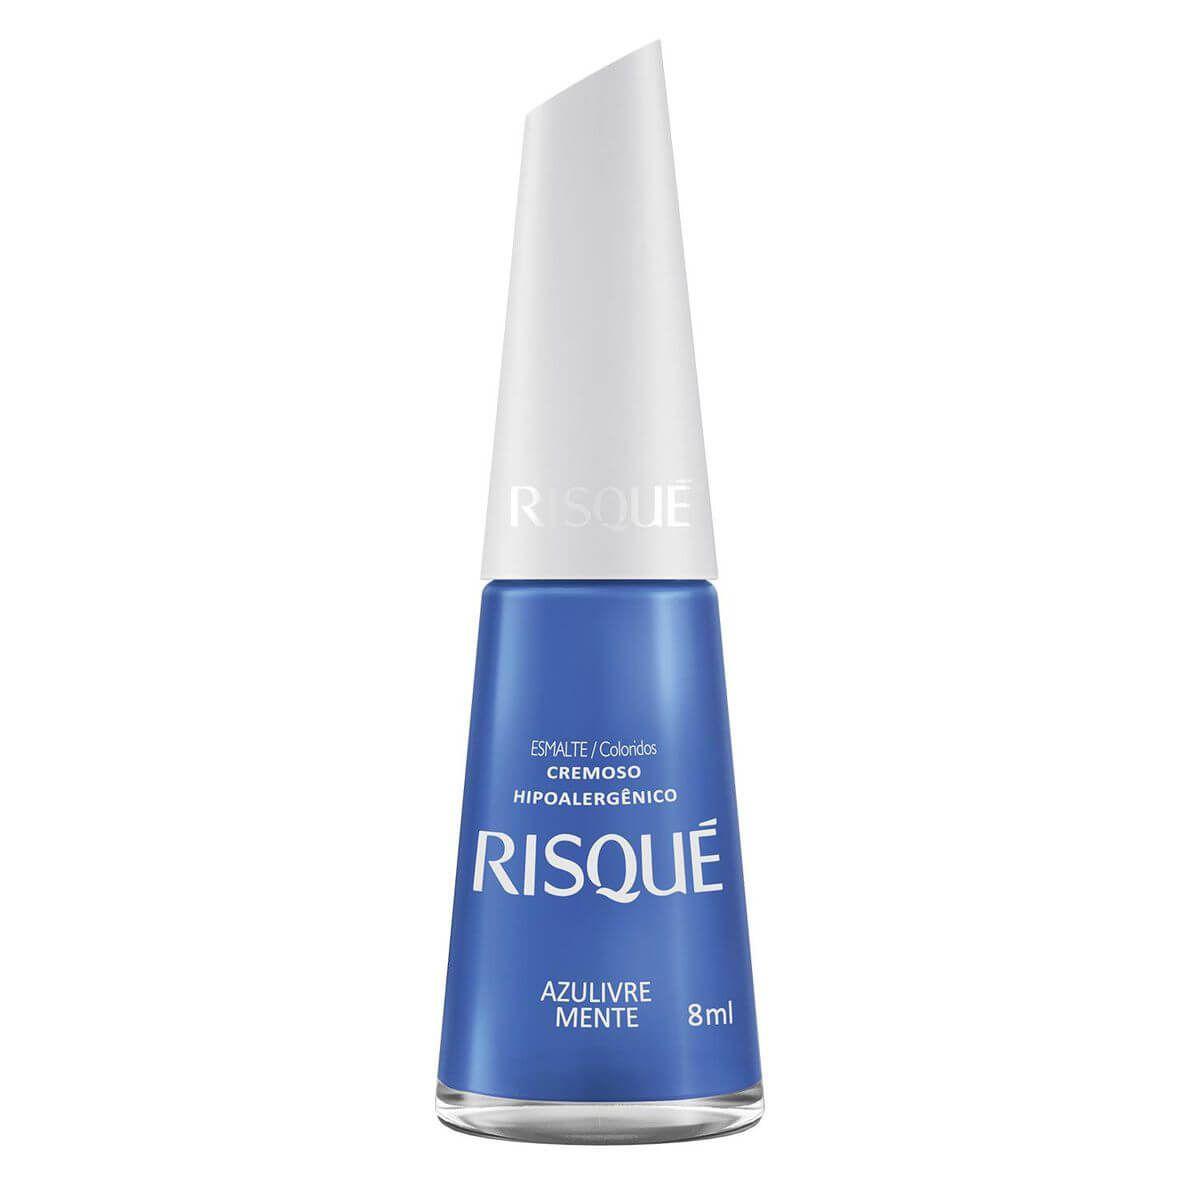 Esmalte Cremoso Azulivre Mente 8ml - Risqué